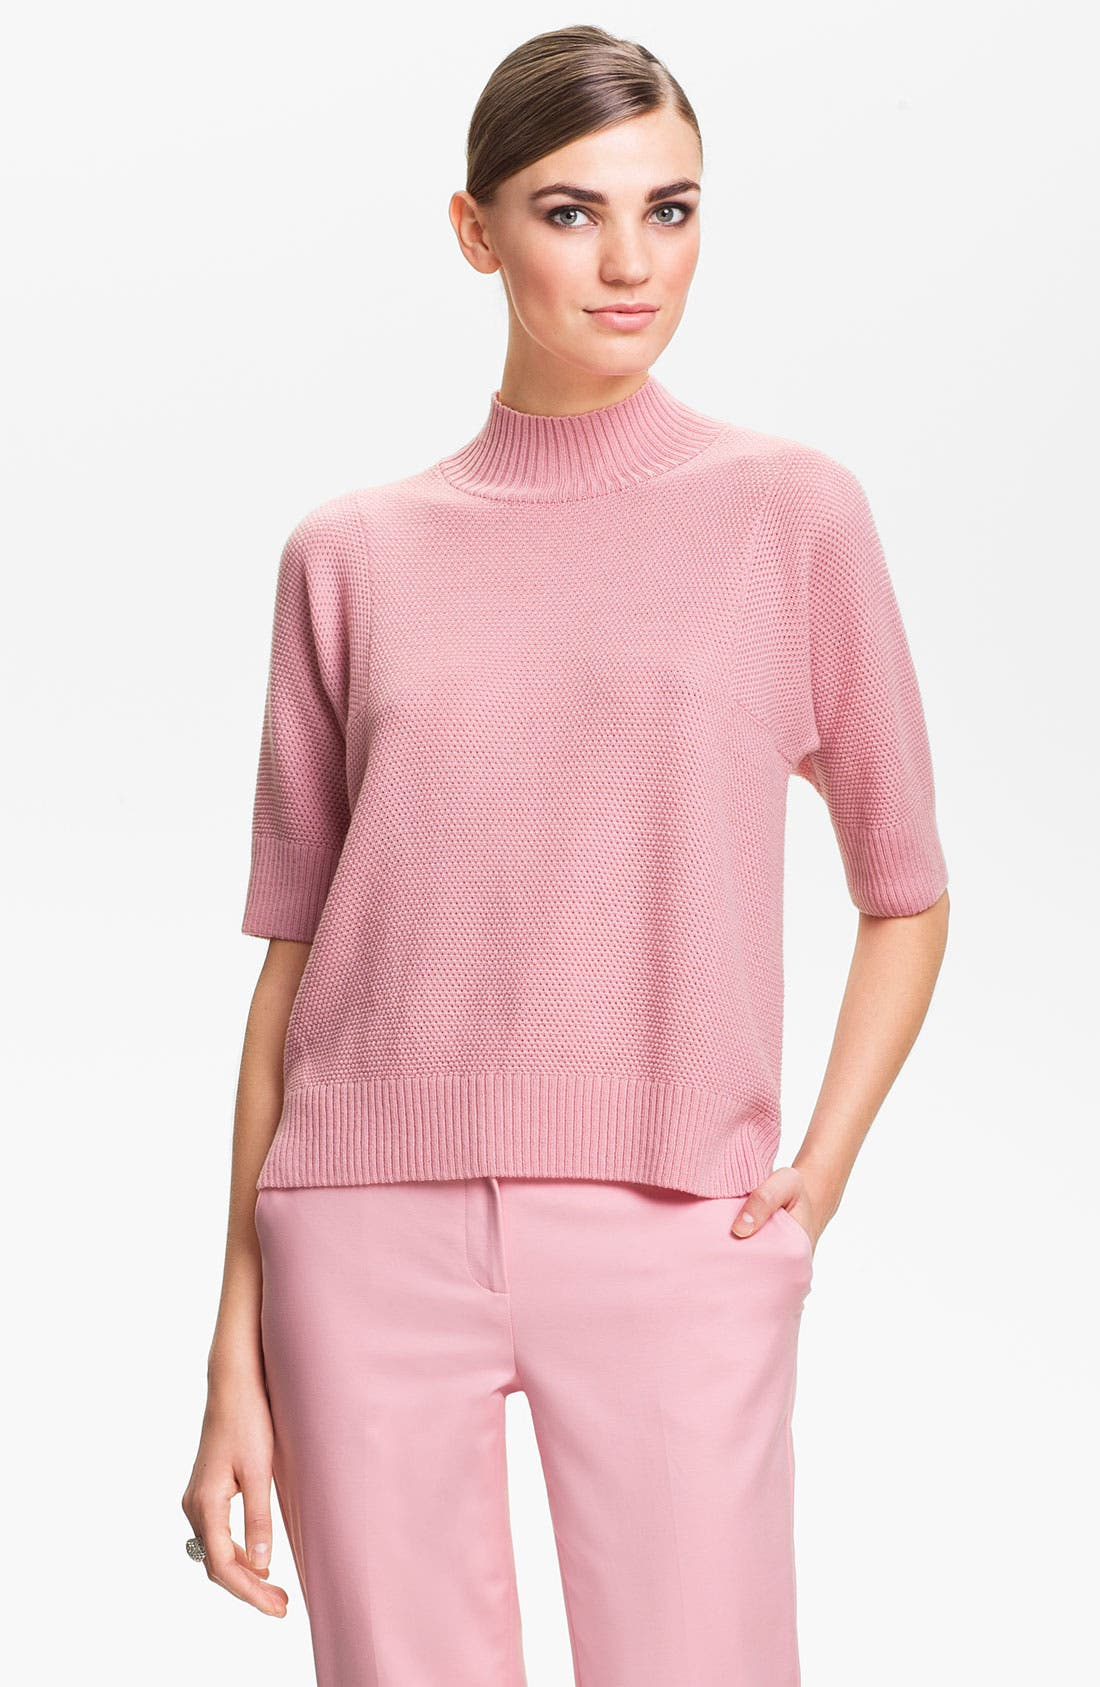 Alternate Image 1 Selected - St. John Yellow Label Mini Popcorn Knit Sweater